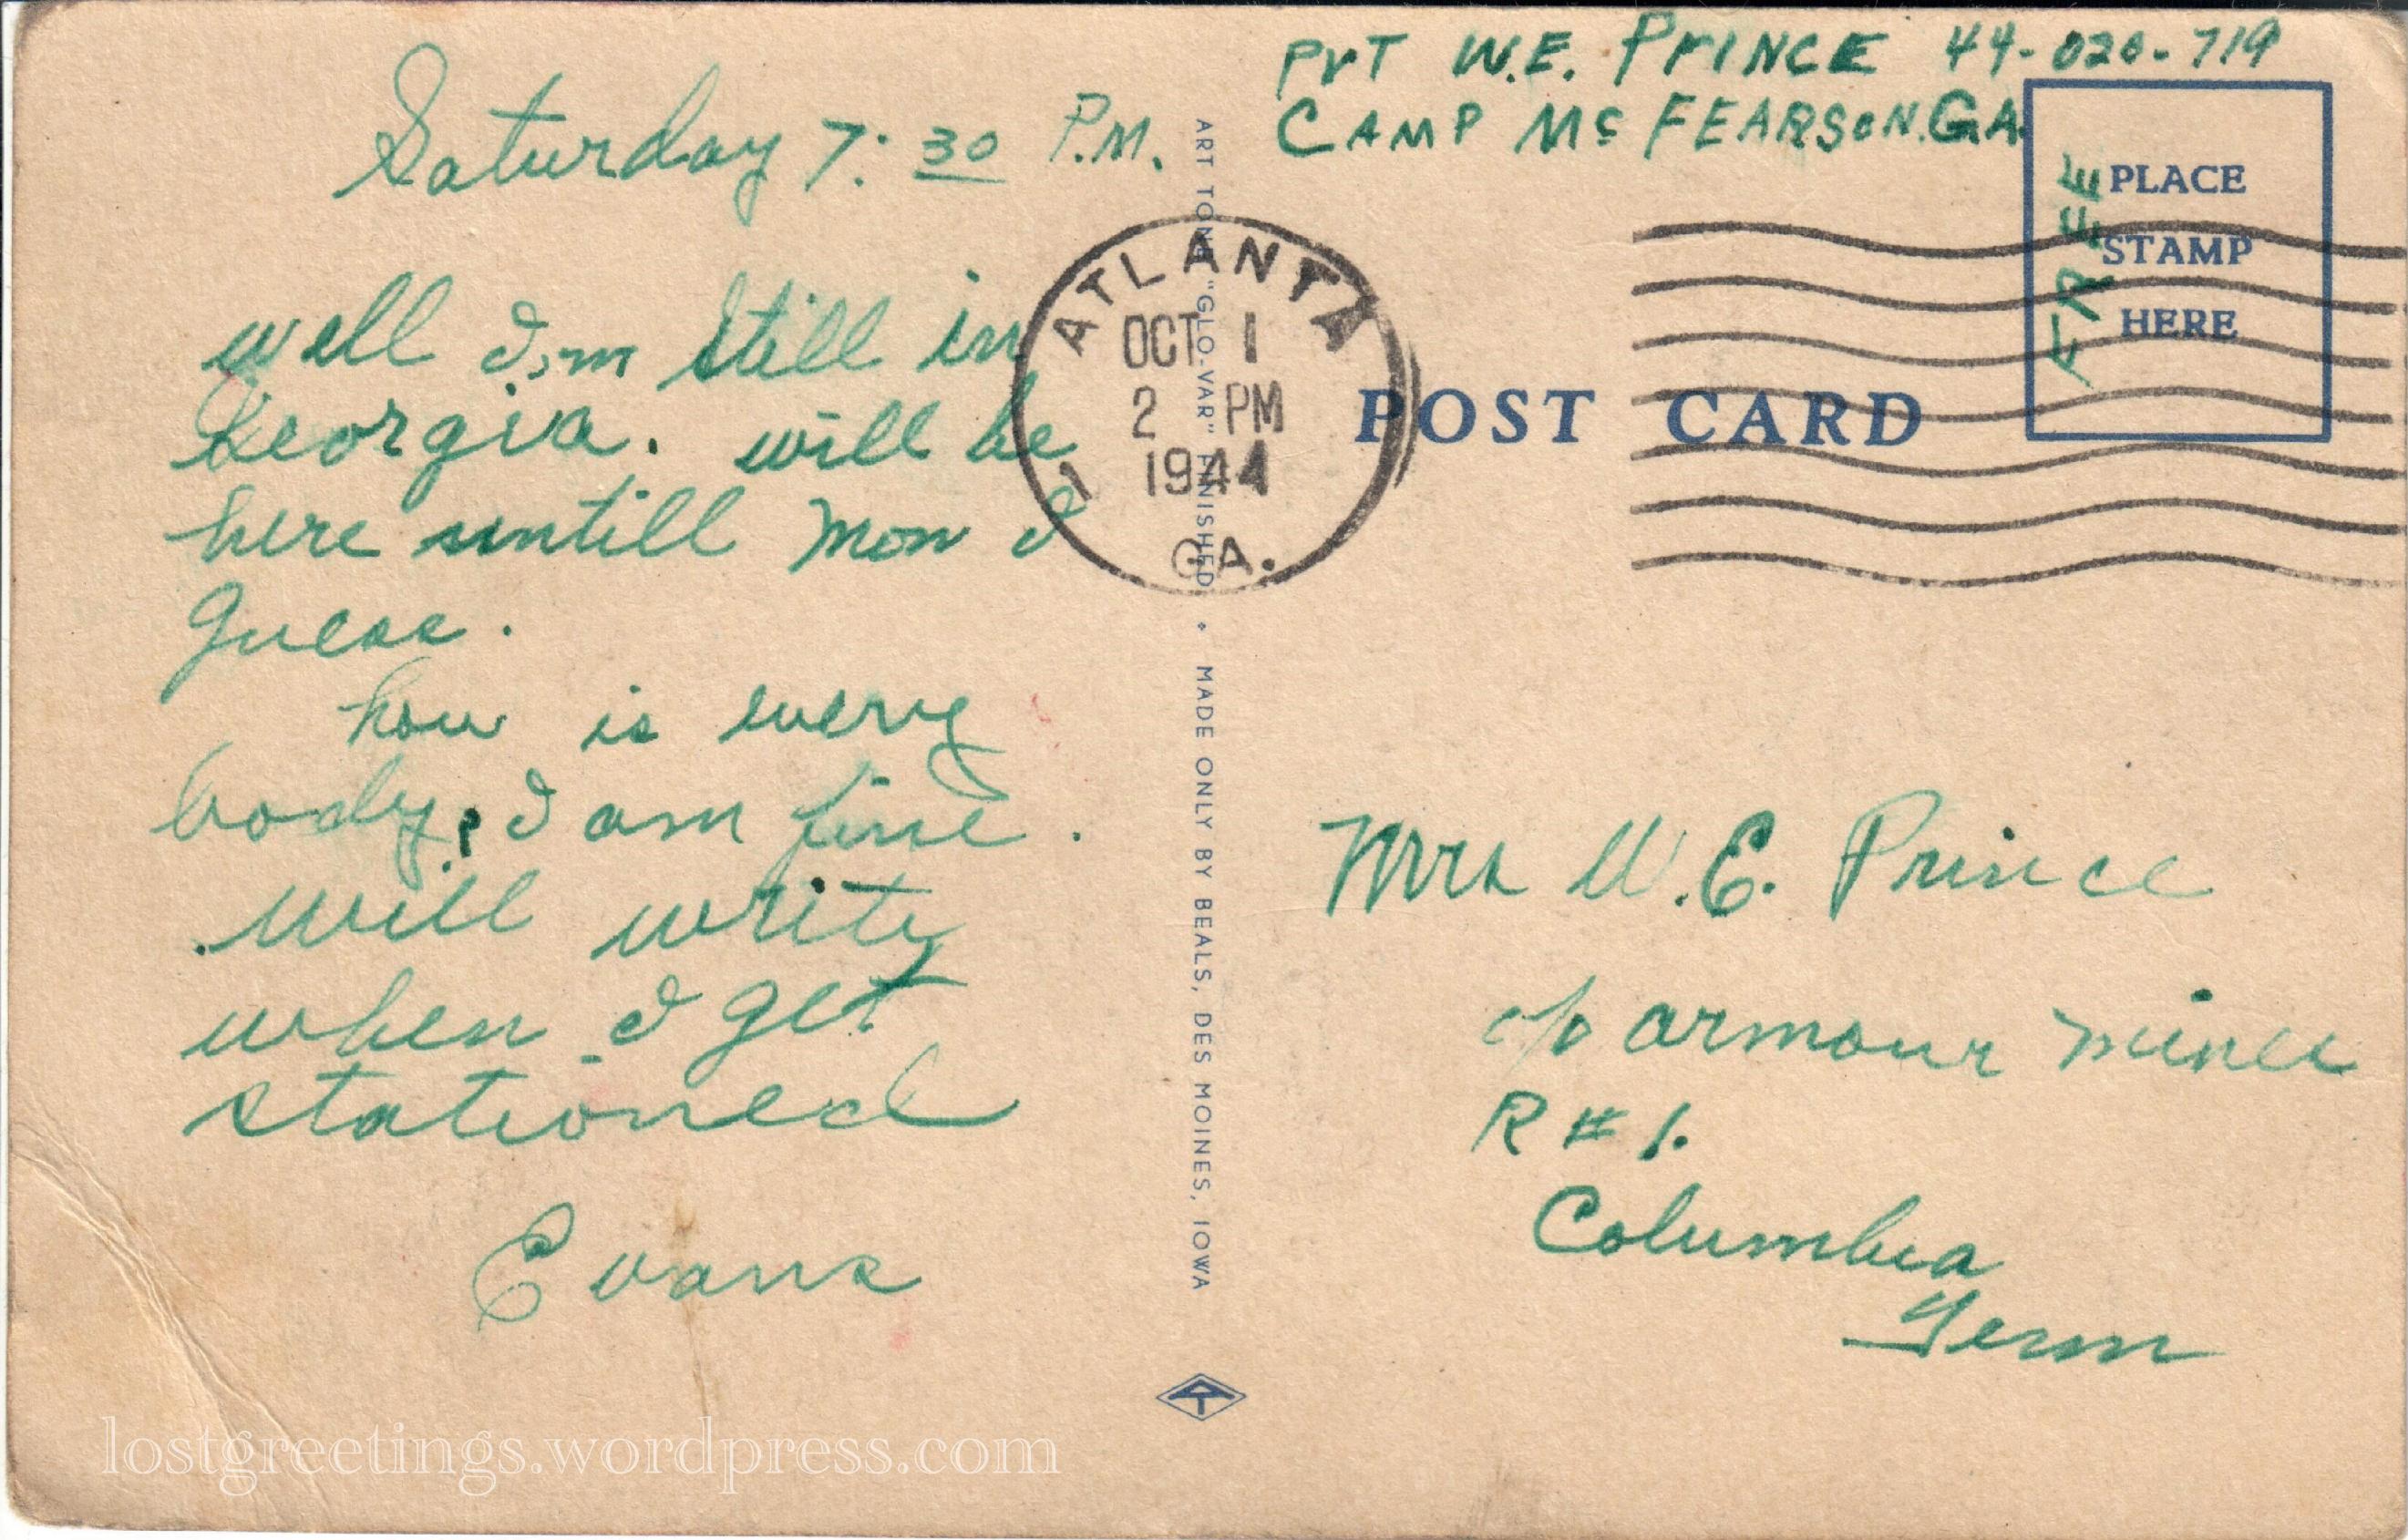 Camp McFearson Atlanta, GA - postcard message lg